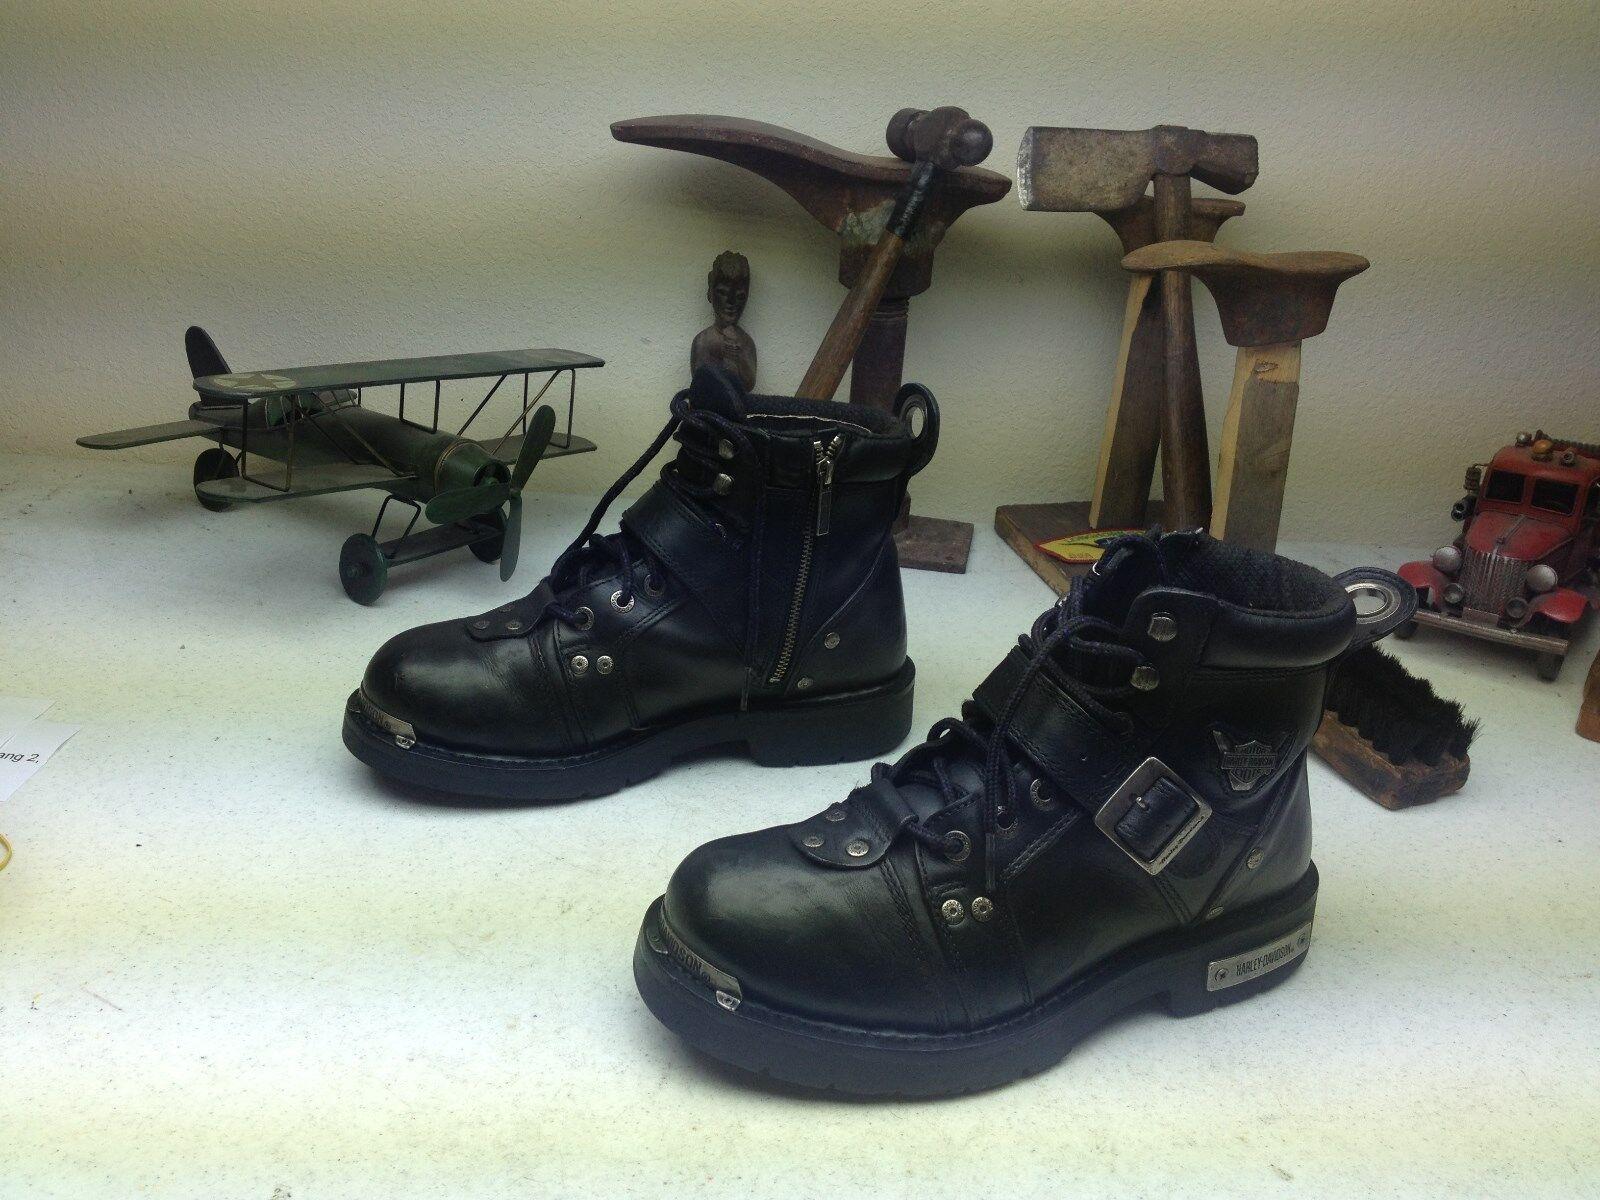 ZIP LACE HARLEY-DAVIDSON MOTORCYCLE ENGINEER schwarz LEATHER BOSS Stiefel Größe 9.5 M